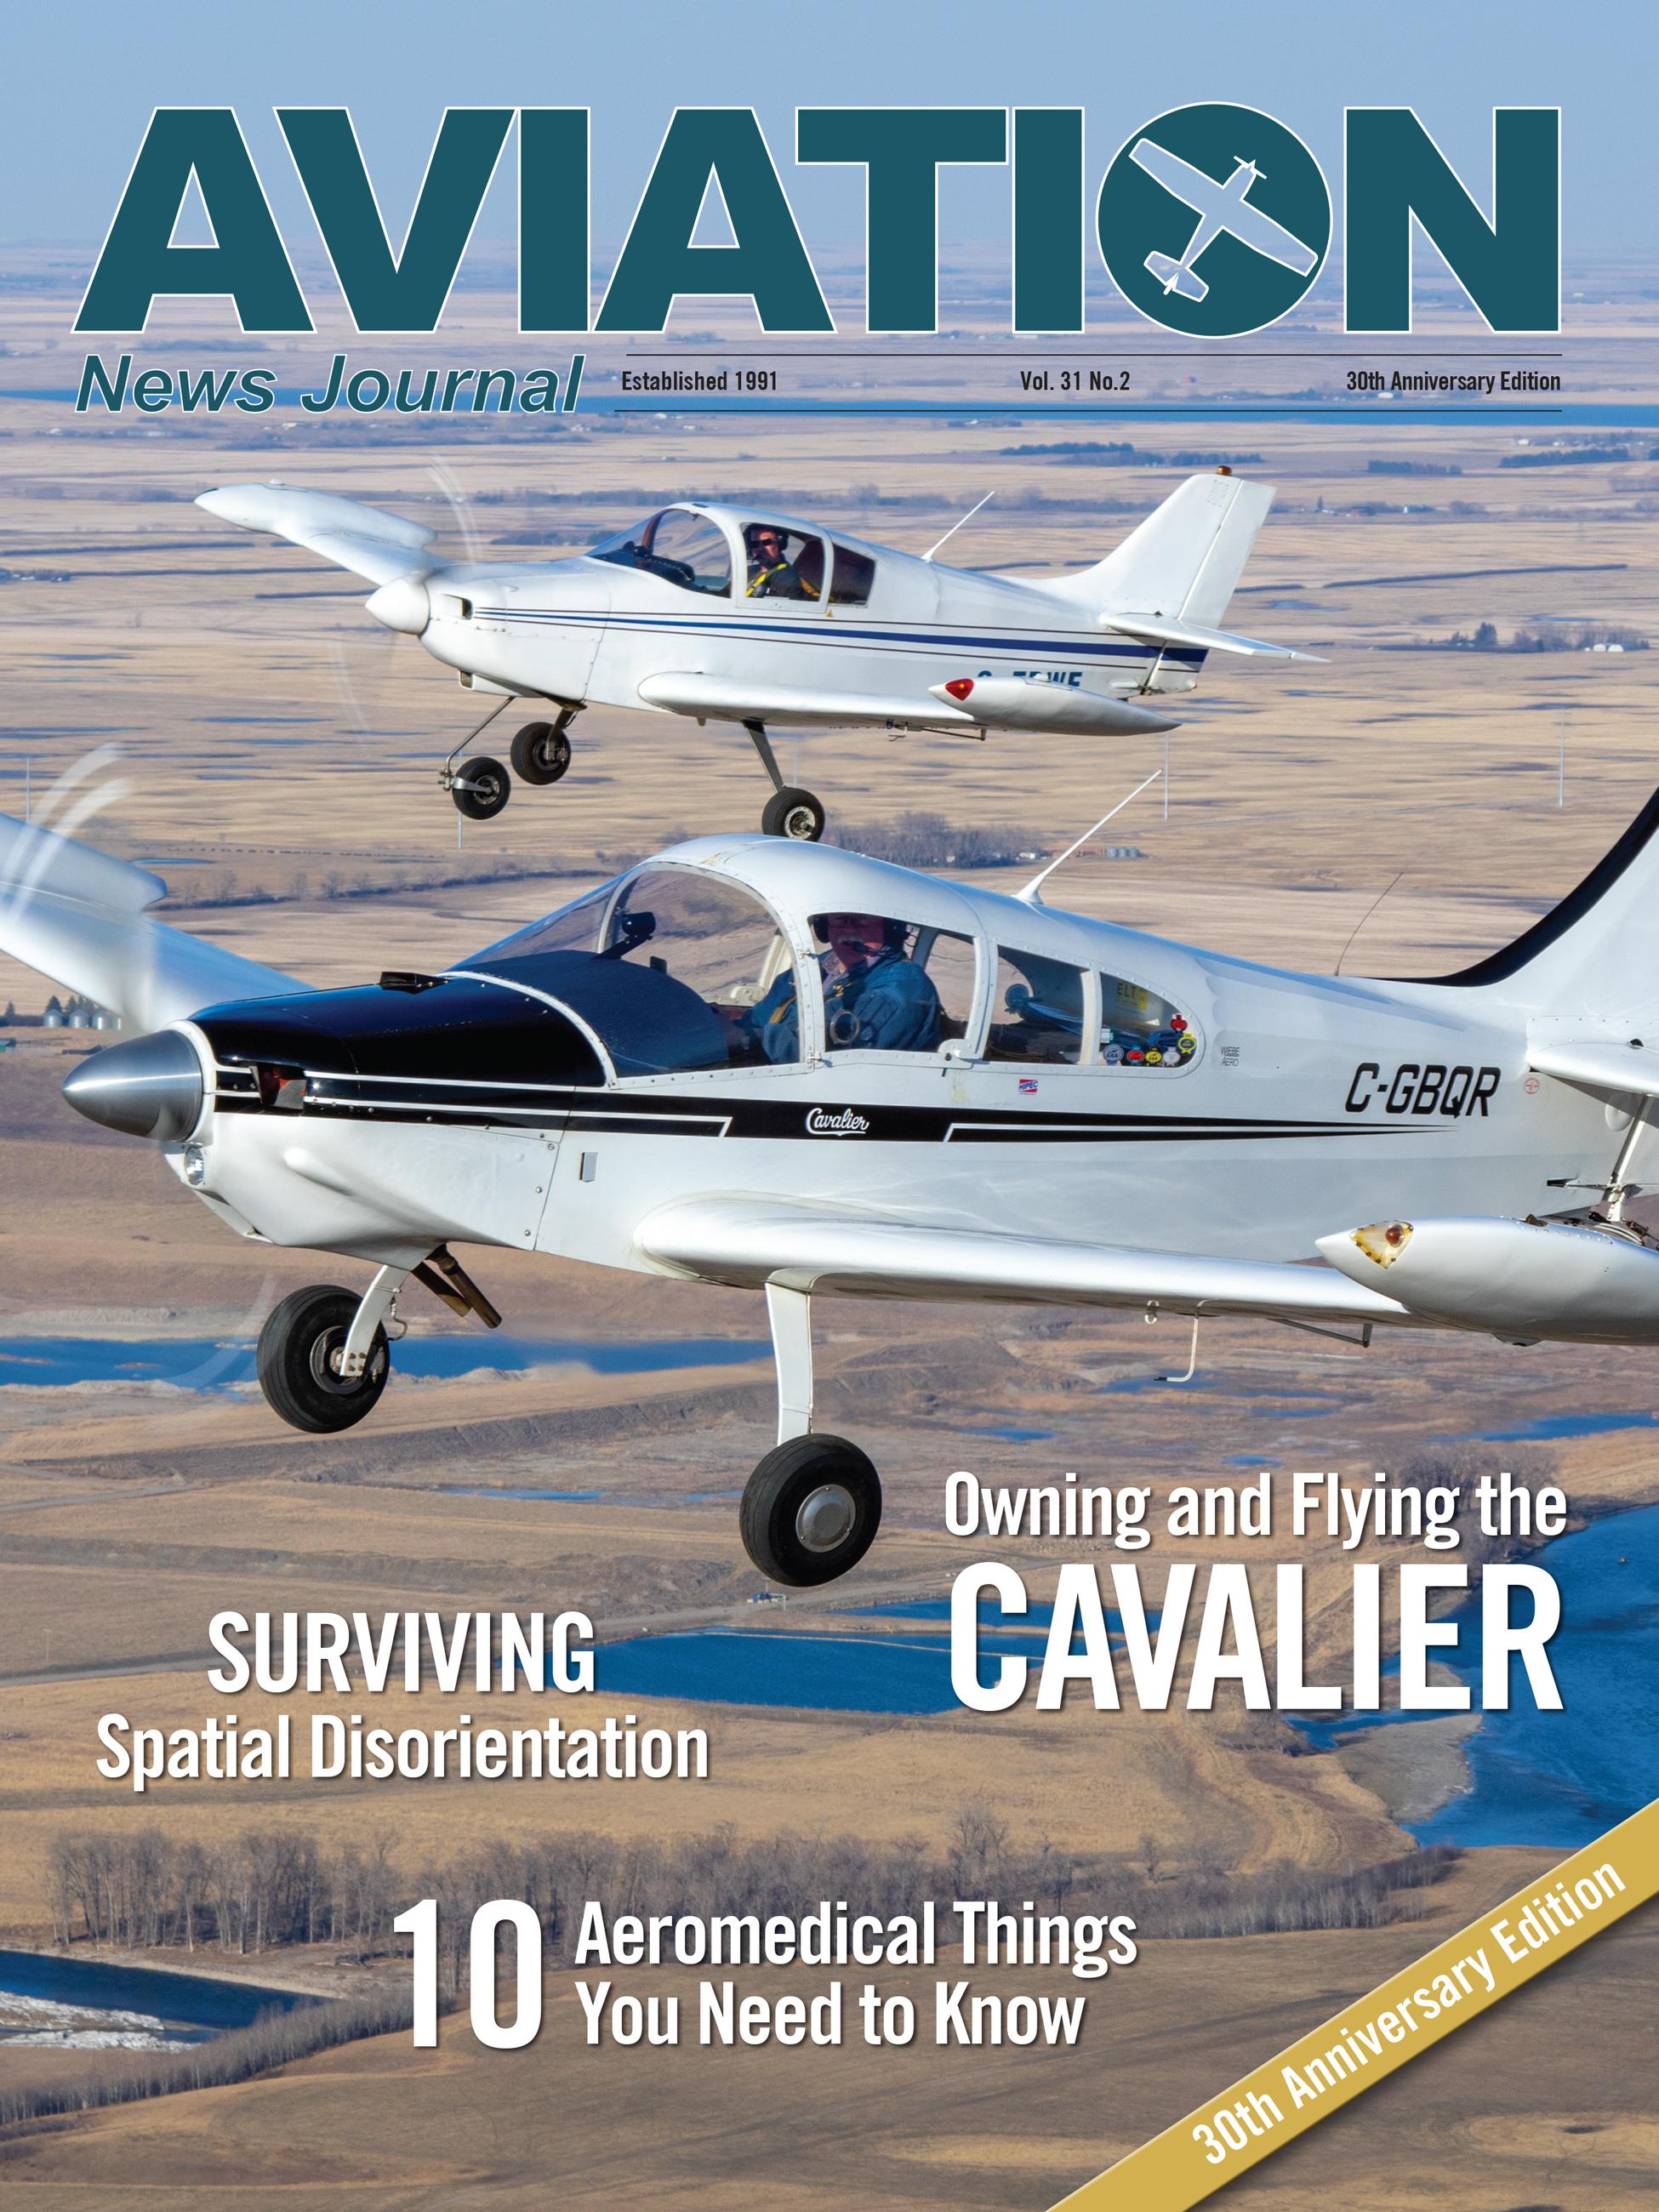 Aviation News Journal - 30th Anniversary Edition